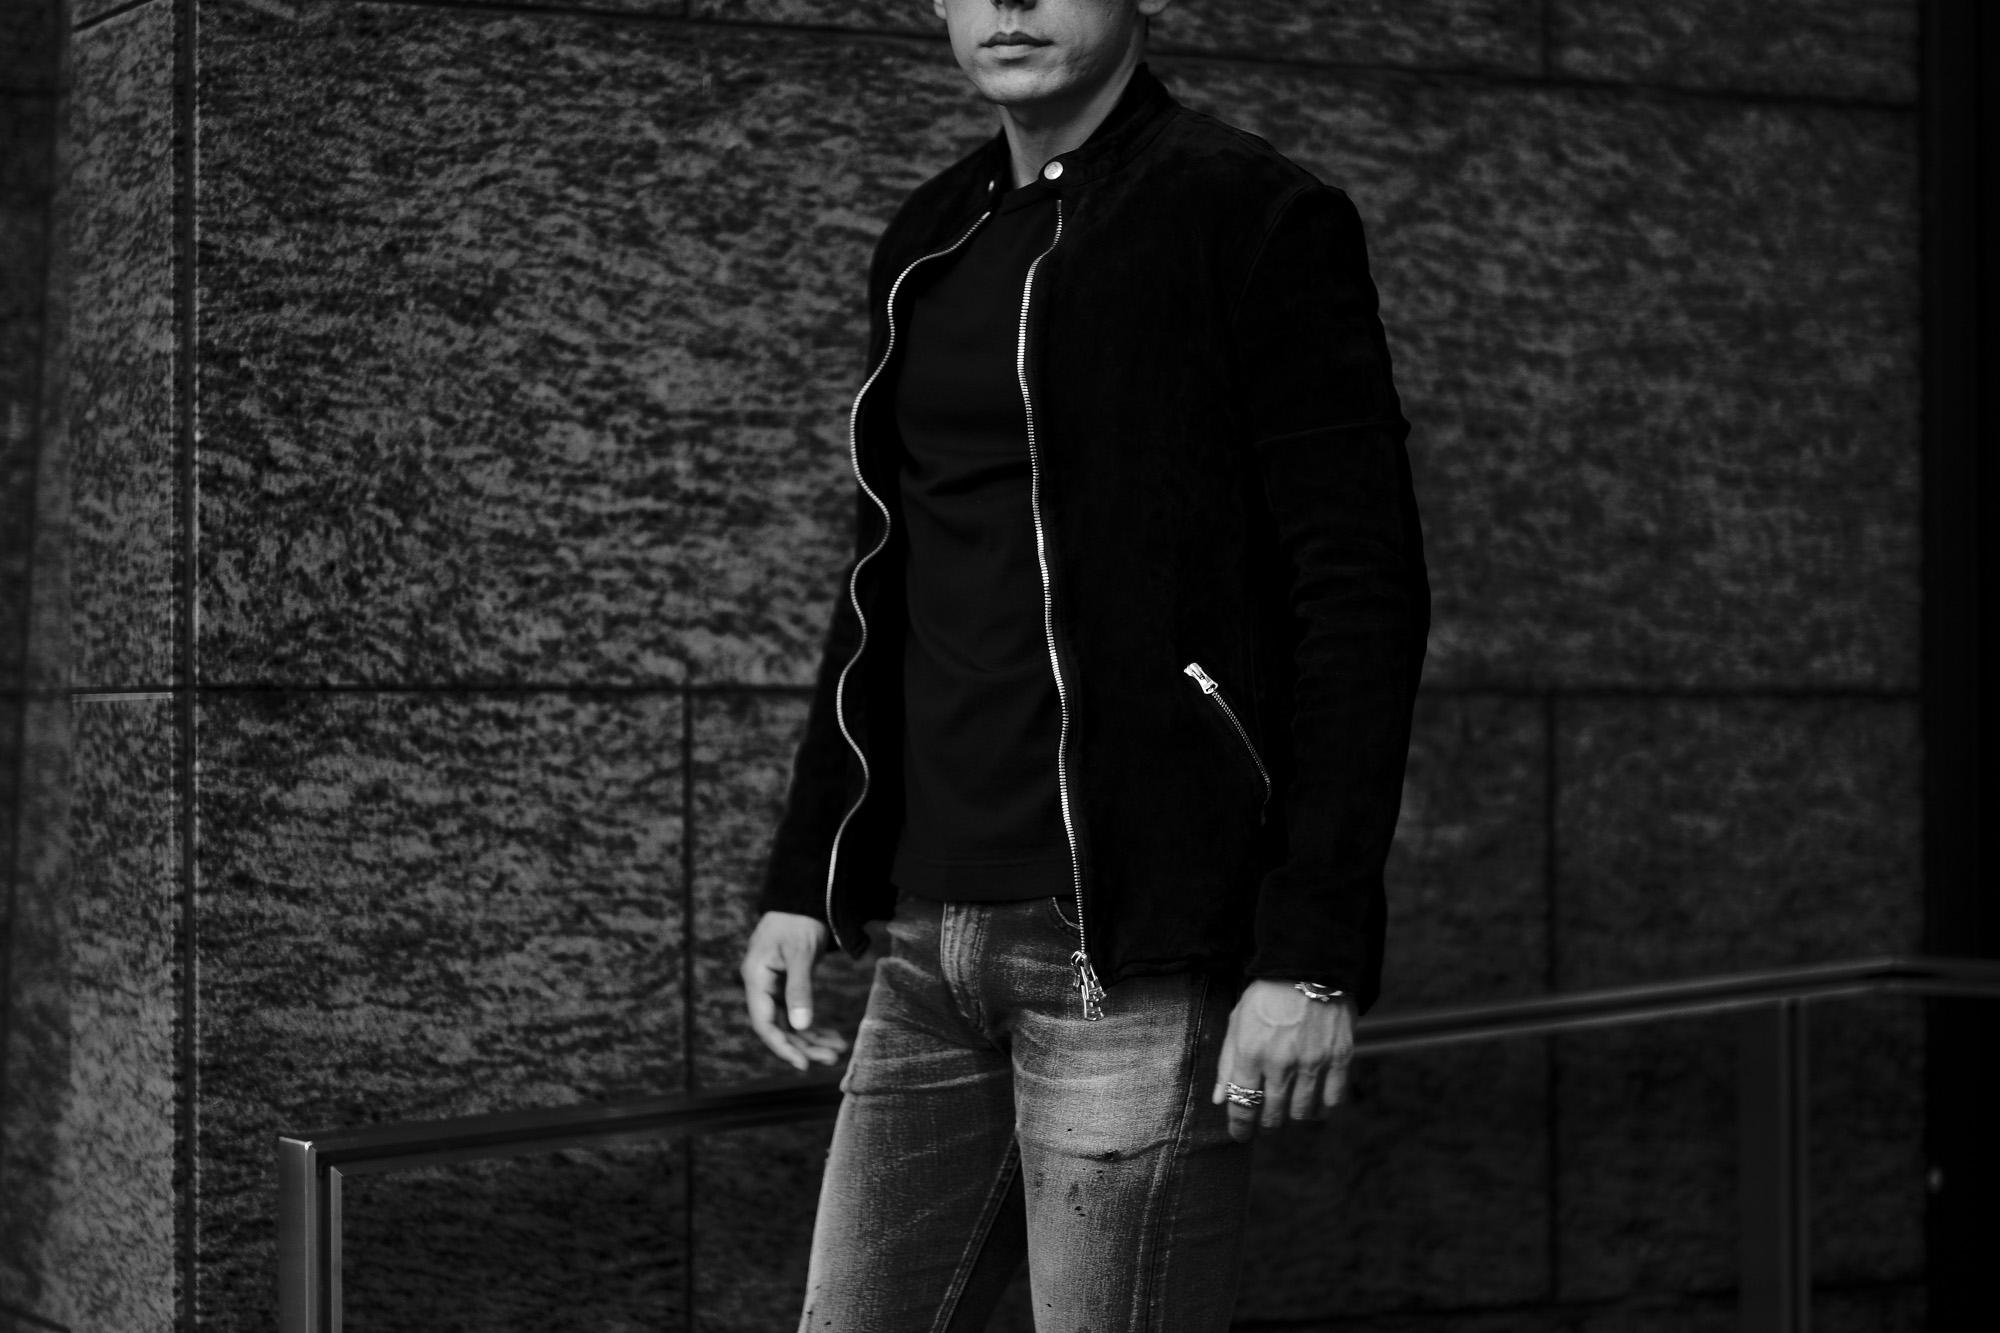 "ISAMU KATAYAMA BACKLASH (イサムカタヤマ バックラッシュ) JAPAN CALF NATURAL DYED ""GARMENT-WASH"" SINGLE RIDERS No.1842-2 (ジャパン カーフ シングルライダース) レザー シングル ライダース ジャケット BLACK (ブラック) MADE IN JAPAN (日本製) 2021秋冬 【Alto e Diritto 別注】【Special Model】愛知 名古屋 Alto e Diritto altoediritto アルトエデリット 片山勇"